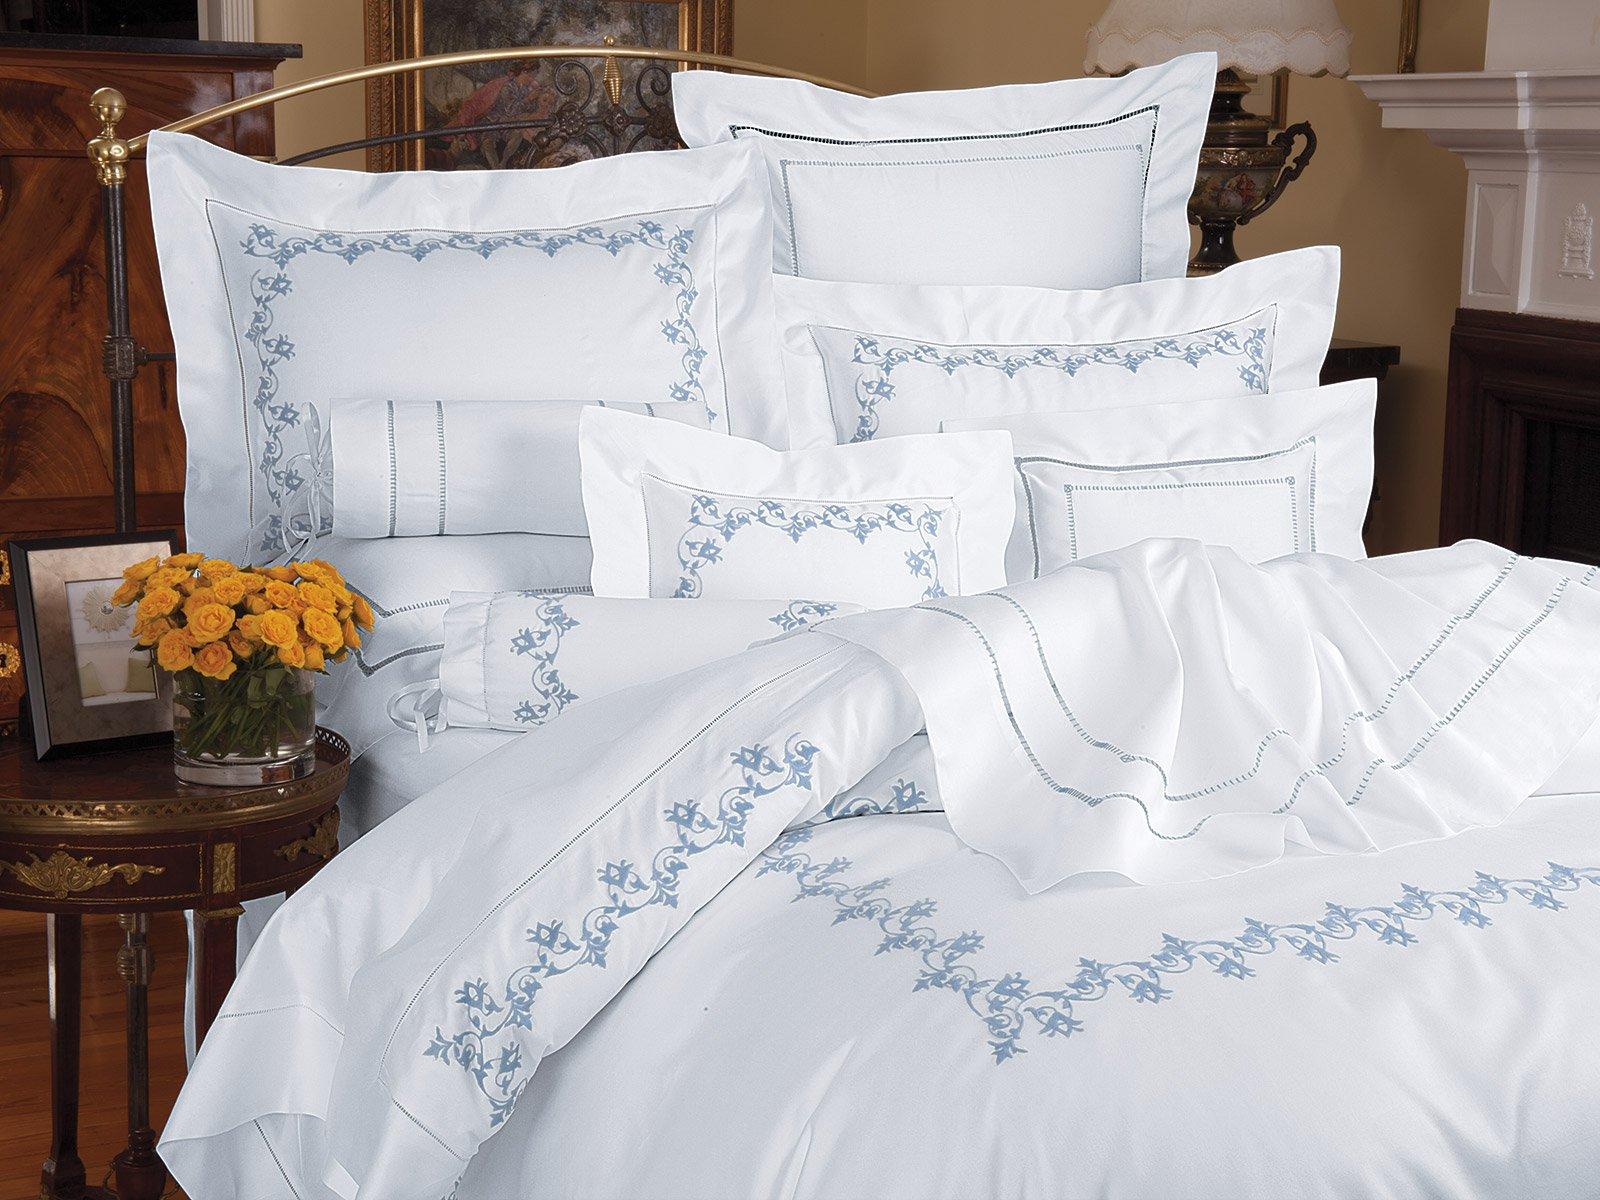 Flowering Vine Luxury Bedding Italian Bed Linens